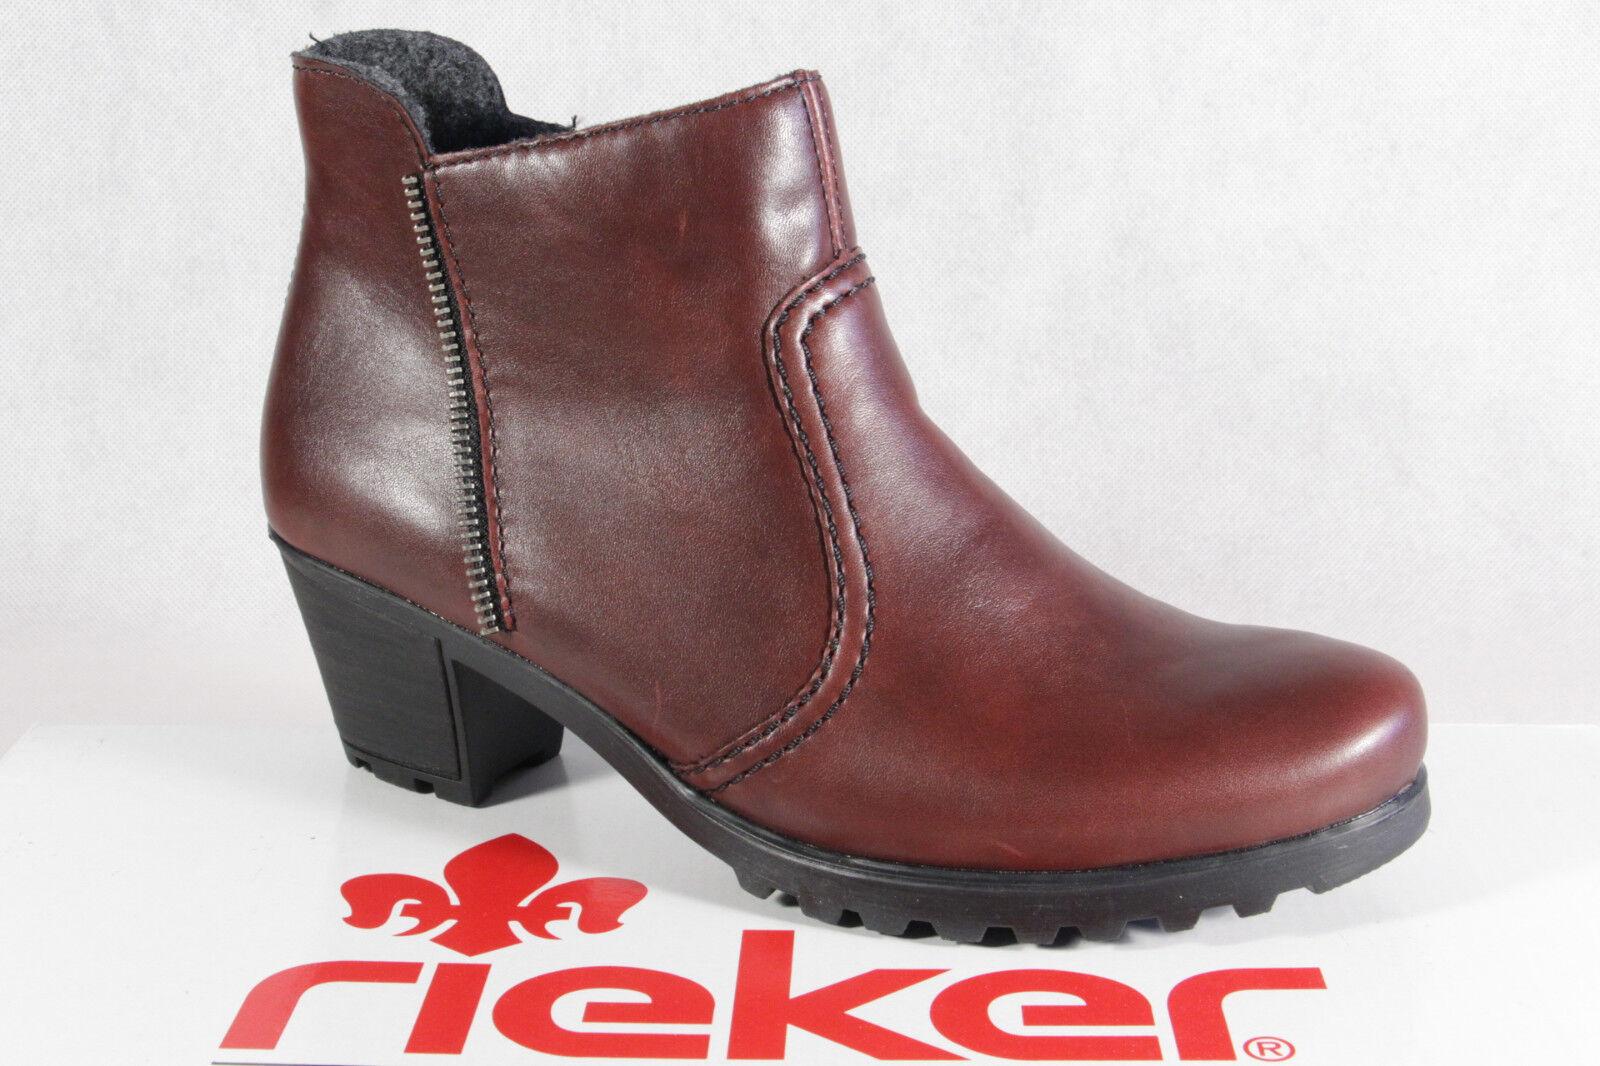 Rieker Damen Stiefel Stiefelette Boots rot Reißverschluß HFYle